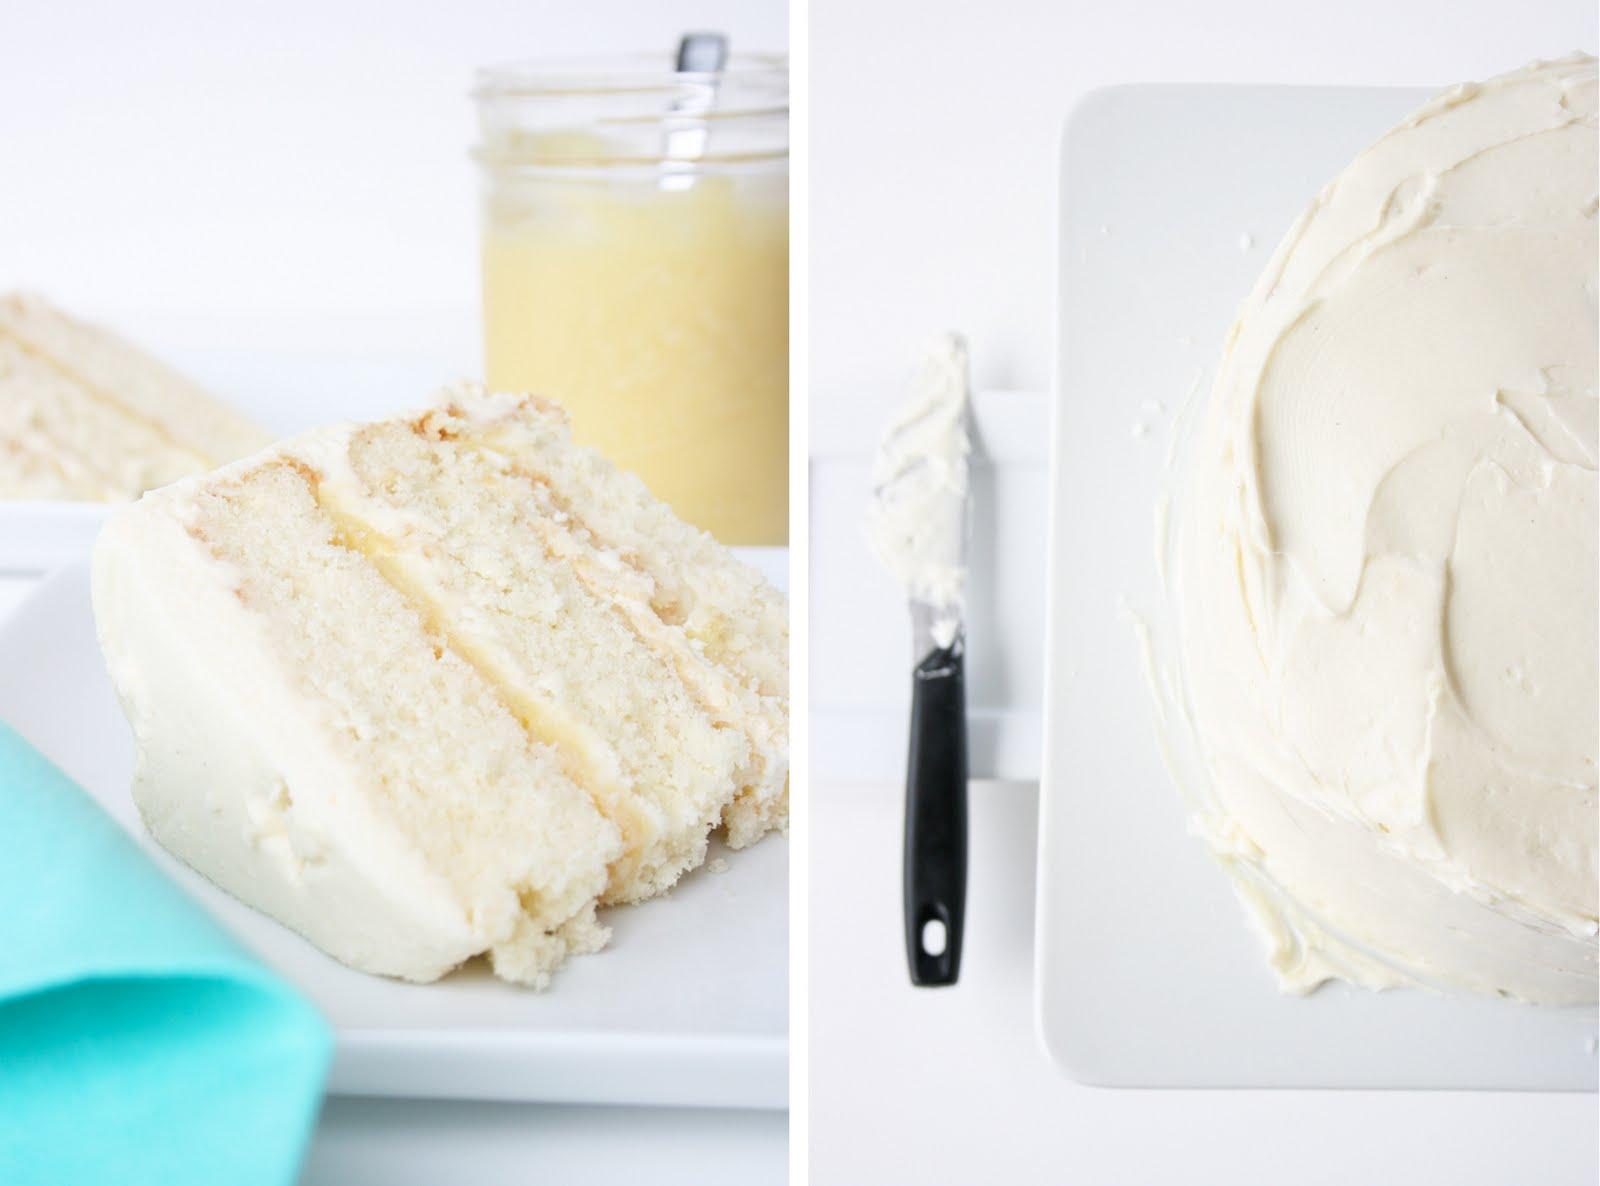 stephmodo Coconut Cake Lemon Curd Fluffy Cream Cheese Frosting